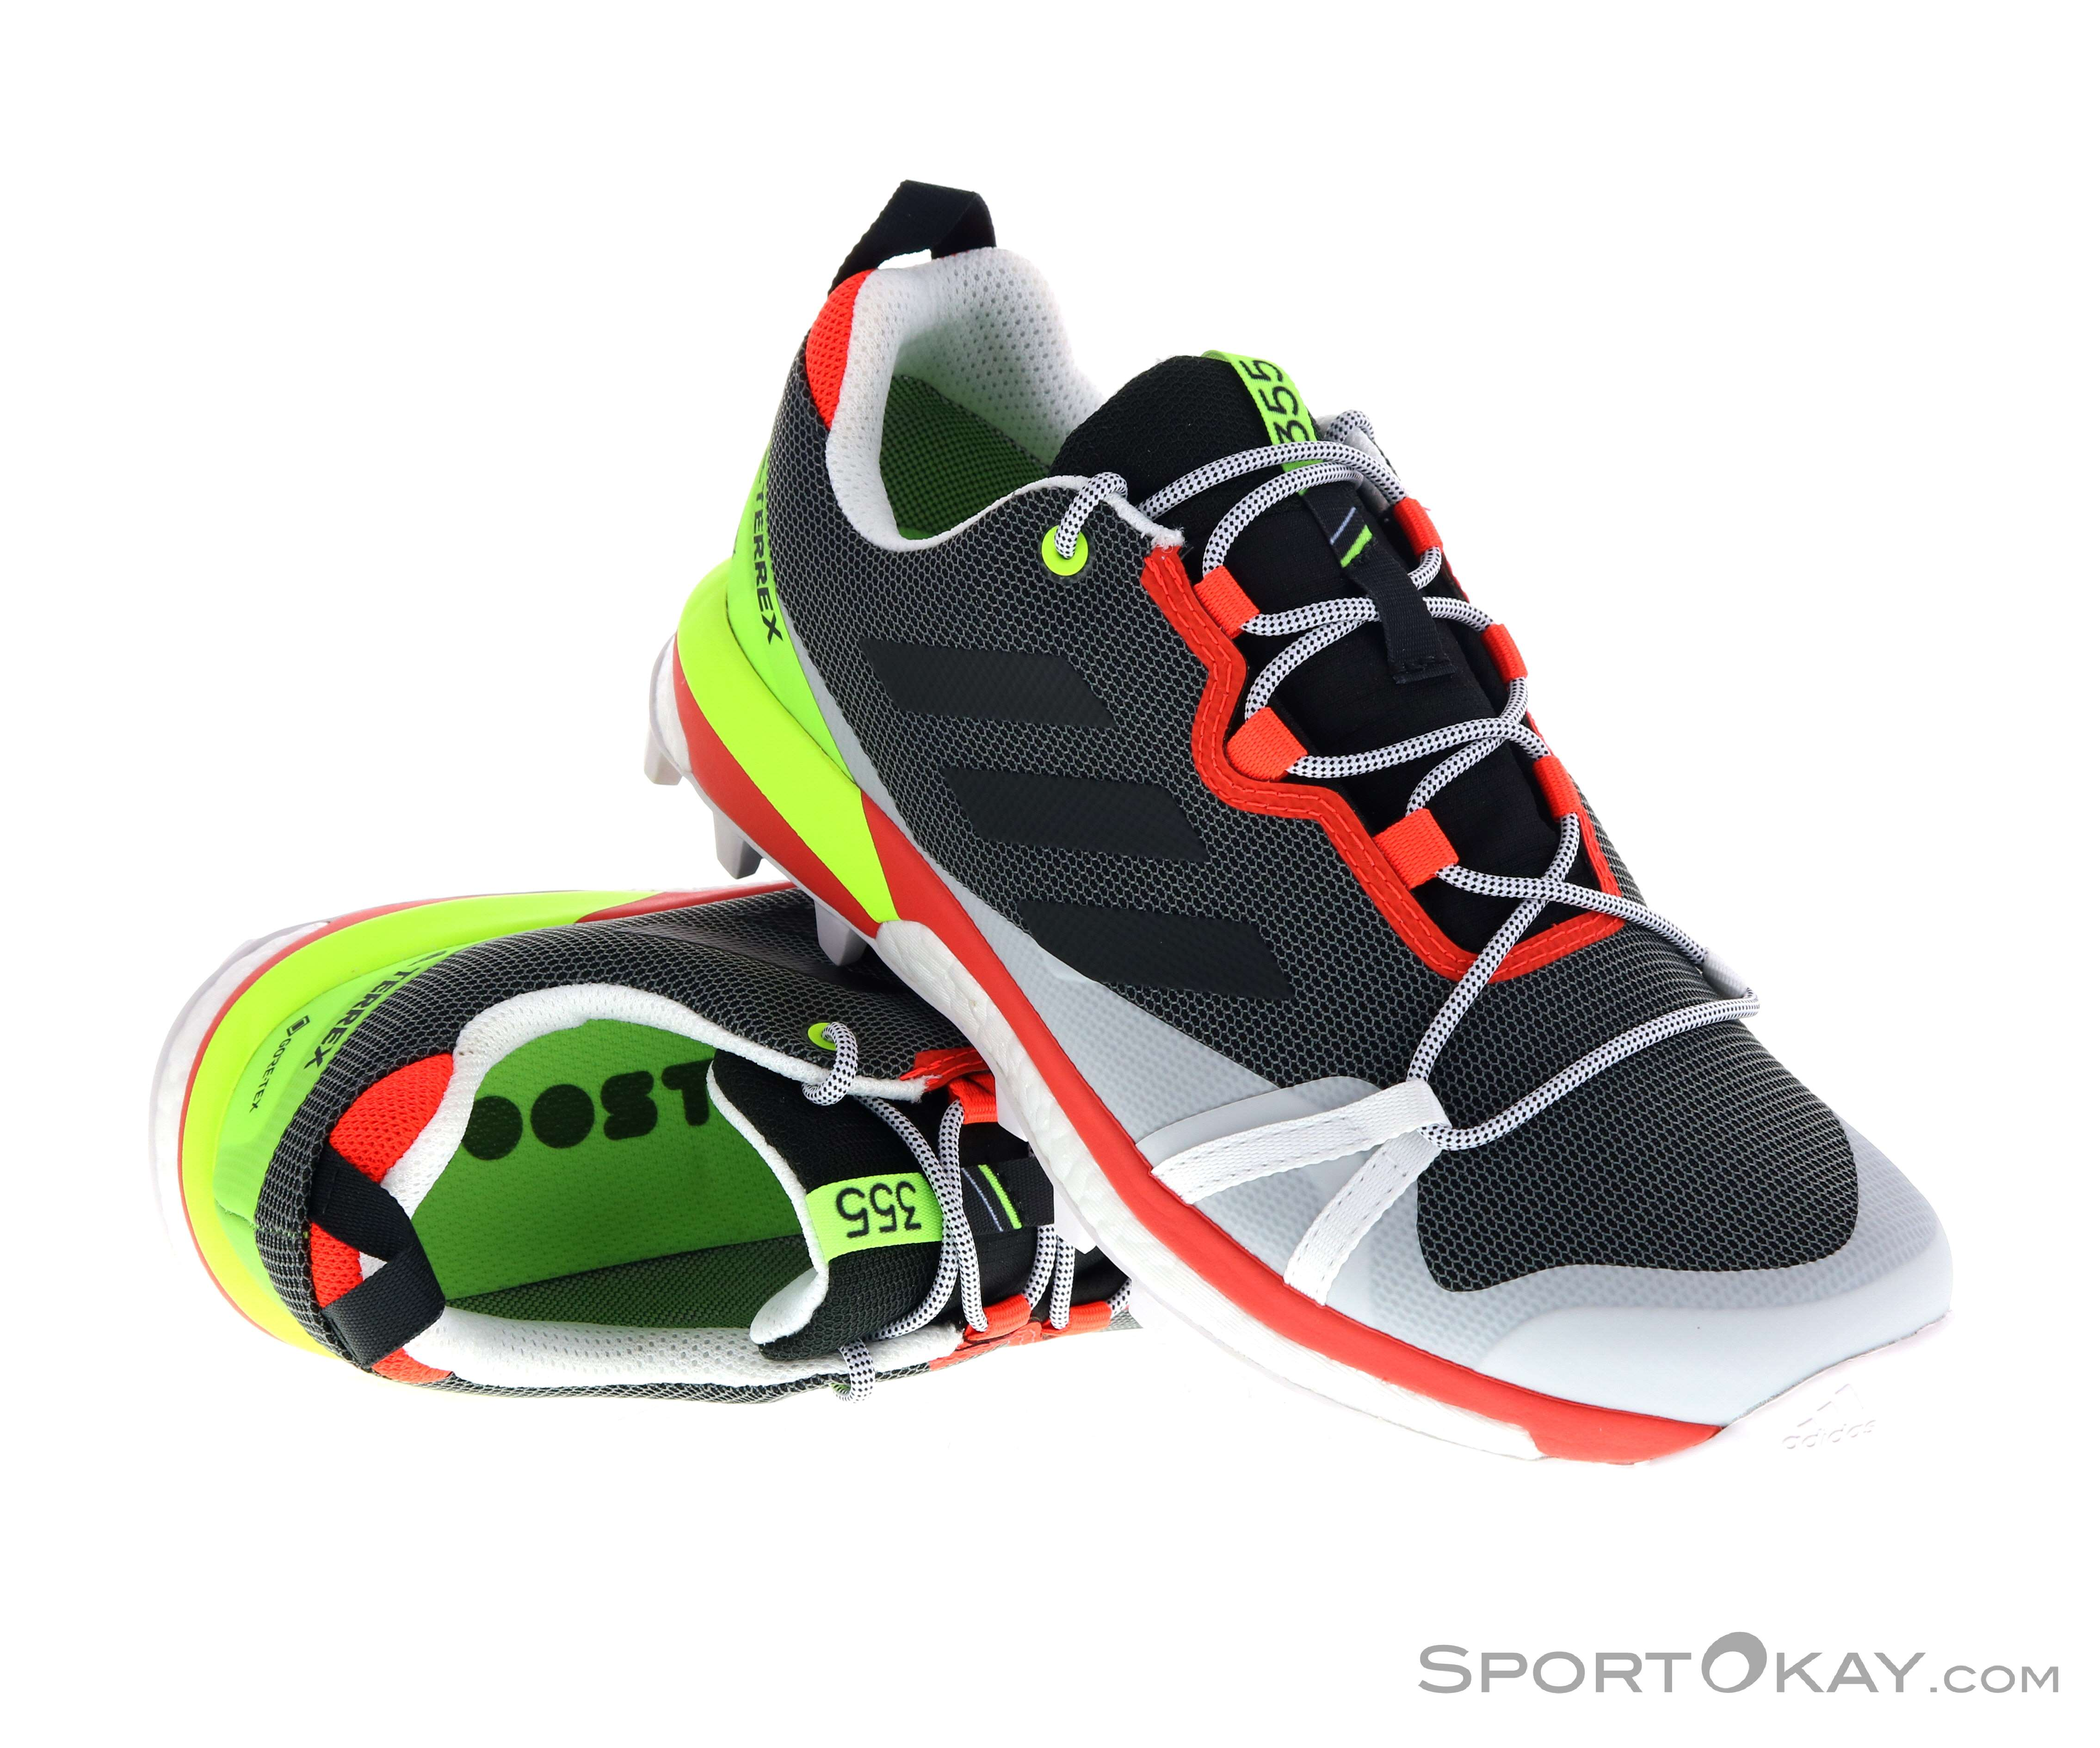 adidas Terrex Skychaser LT GTX Mens Hiking Boots Gore-Tex - Hiking ...